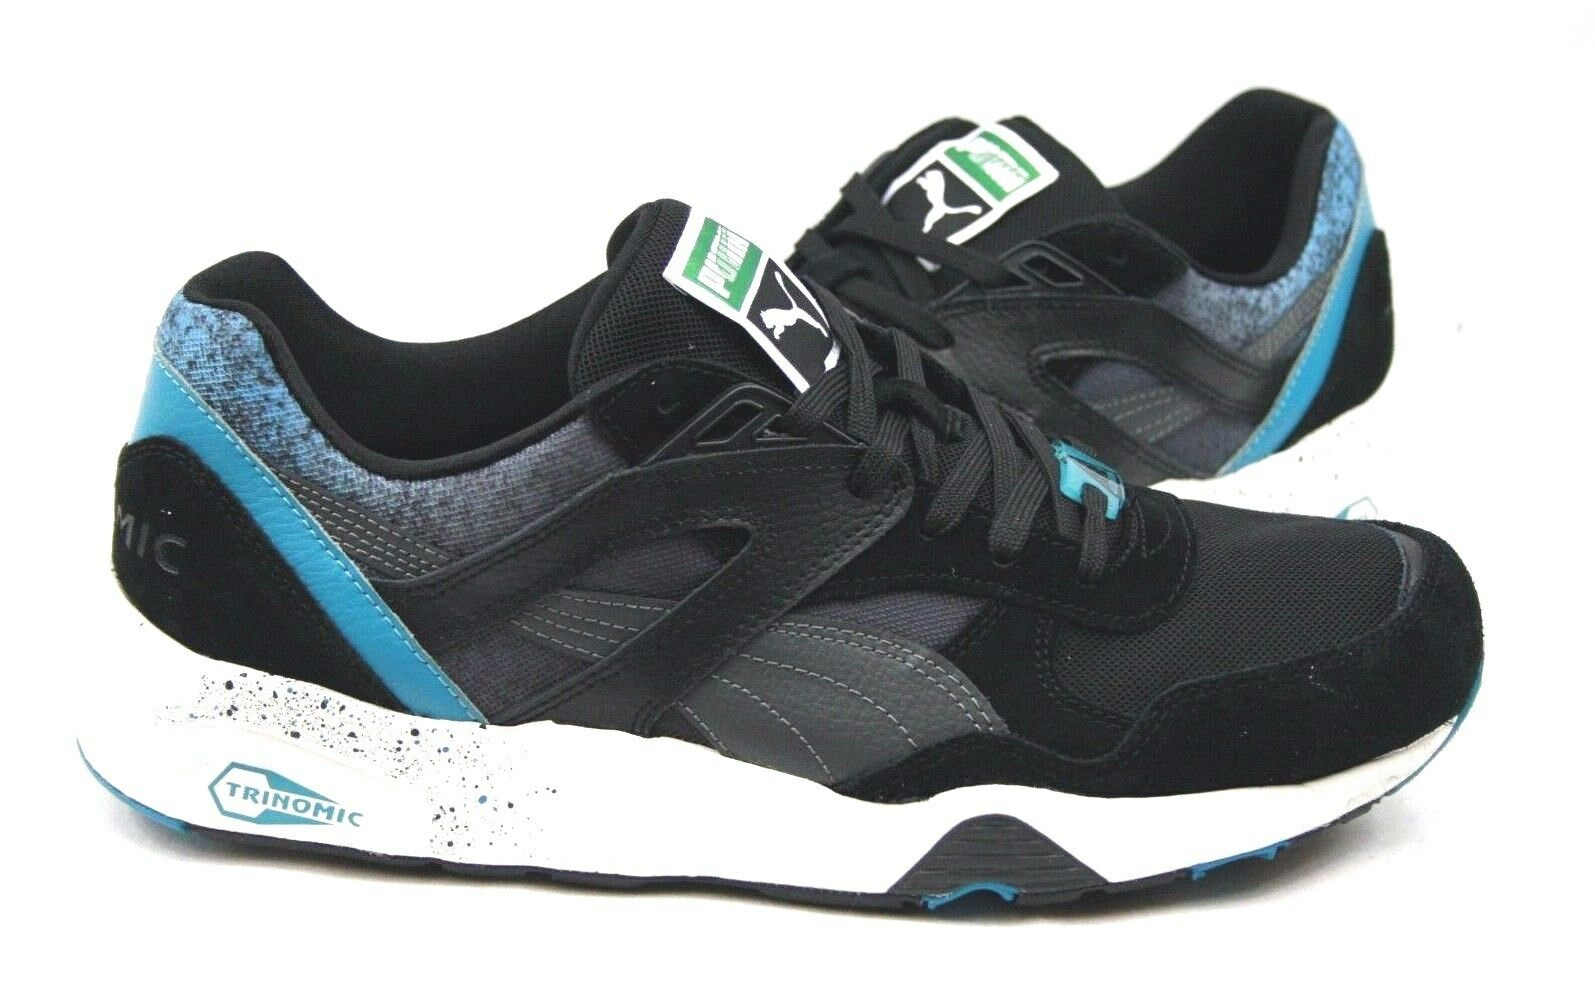 Puma hommes R698 Trinomic Splatter 358628-01 Athletic / Running Sneakers